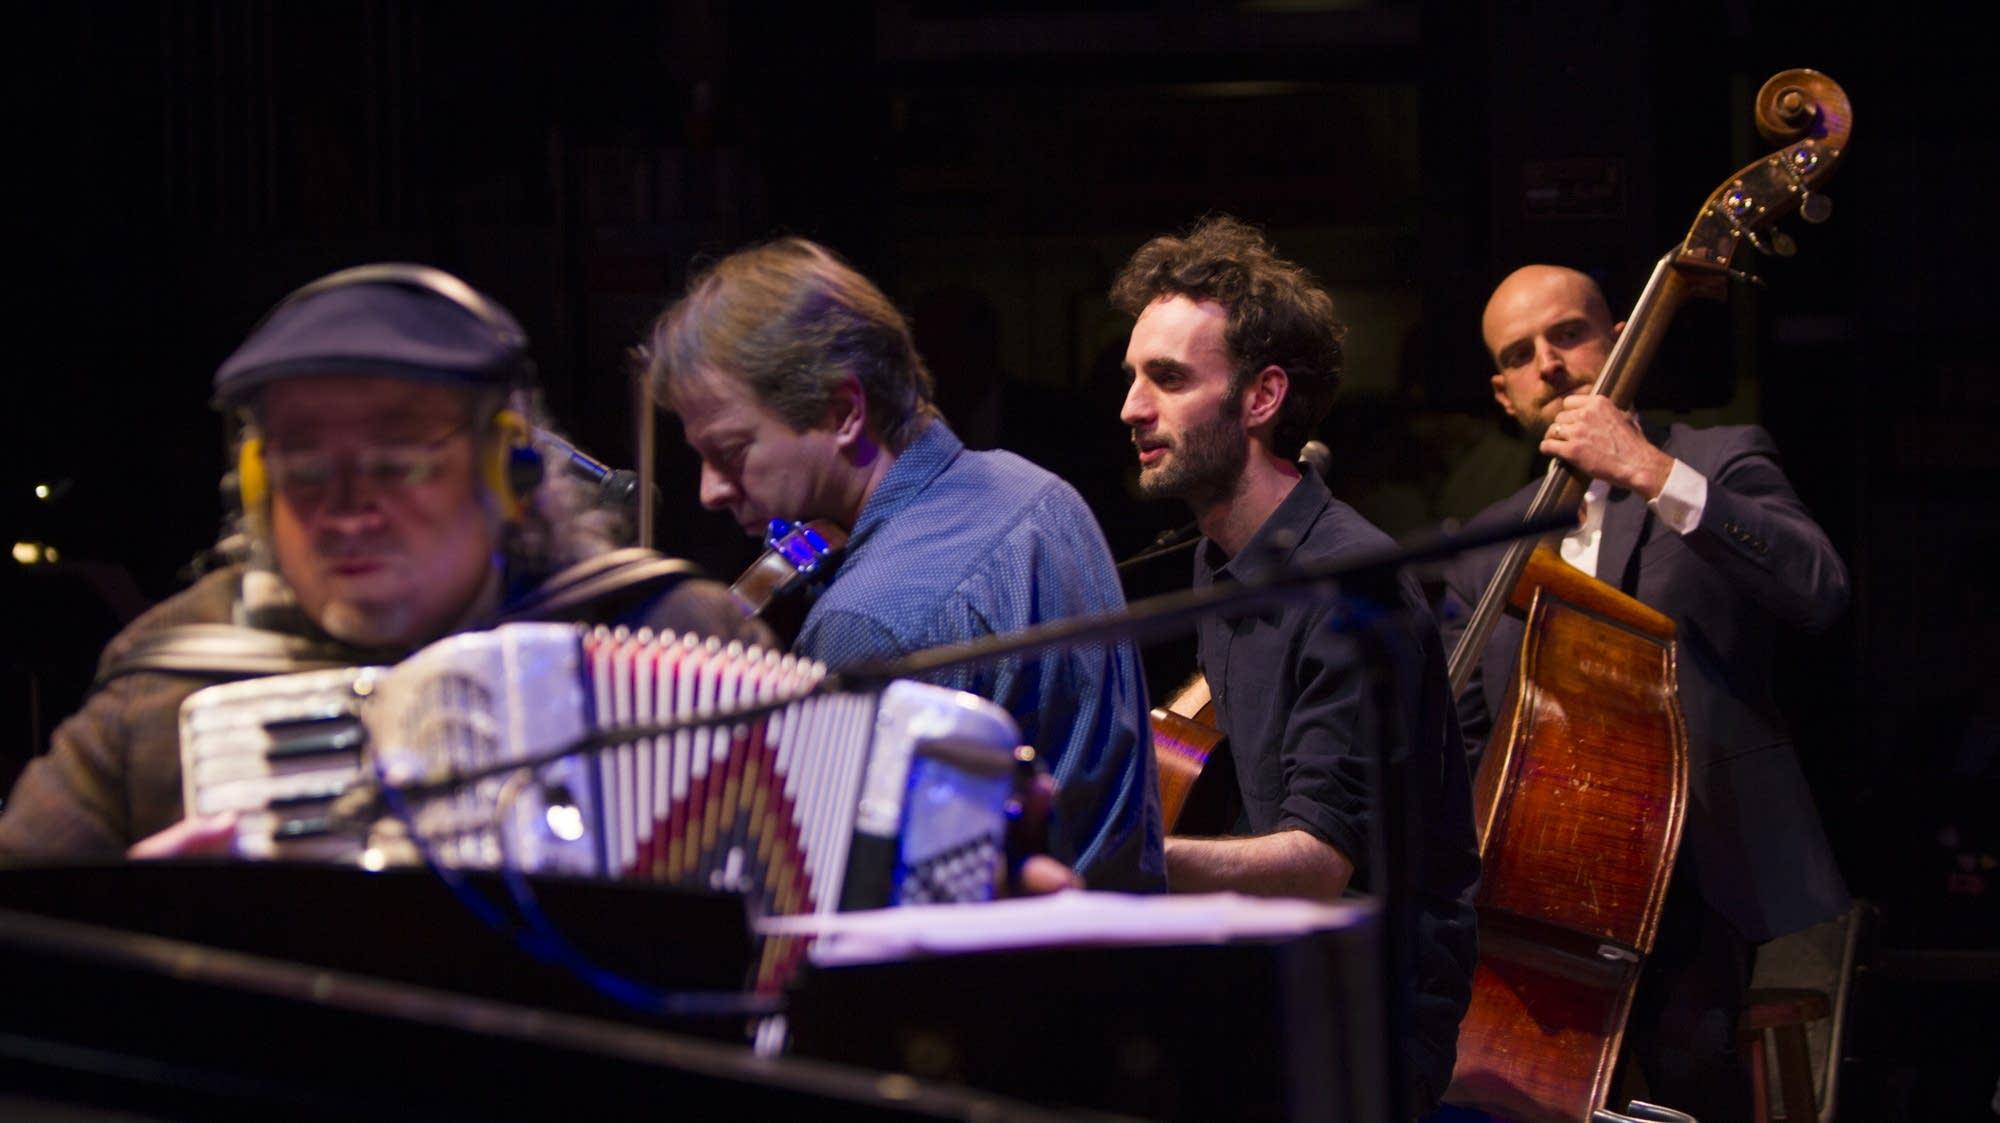 Rich Dworsky, Stuart Duncan, Julian Lage, and Alan Hampton